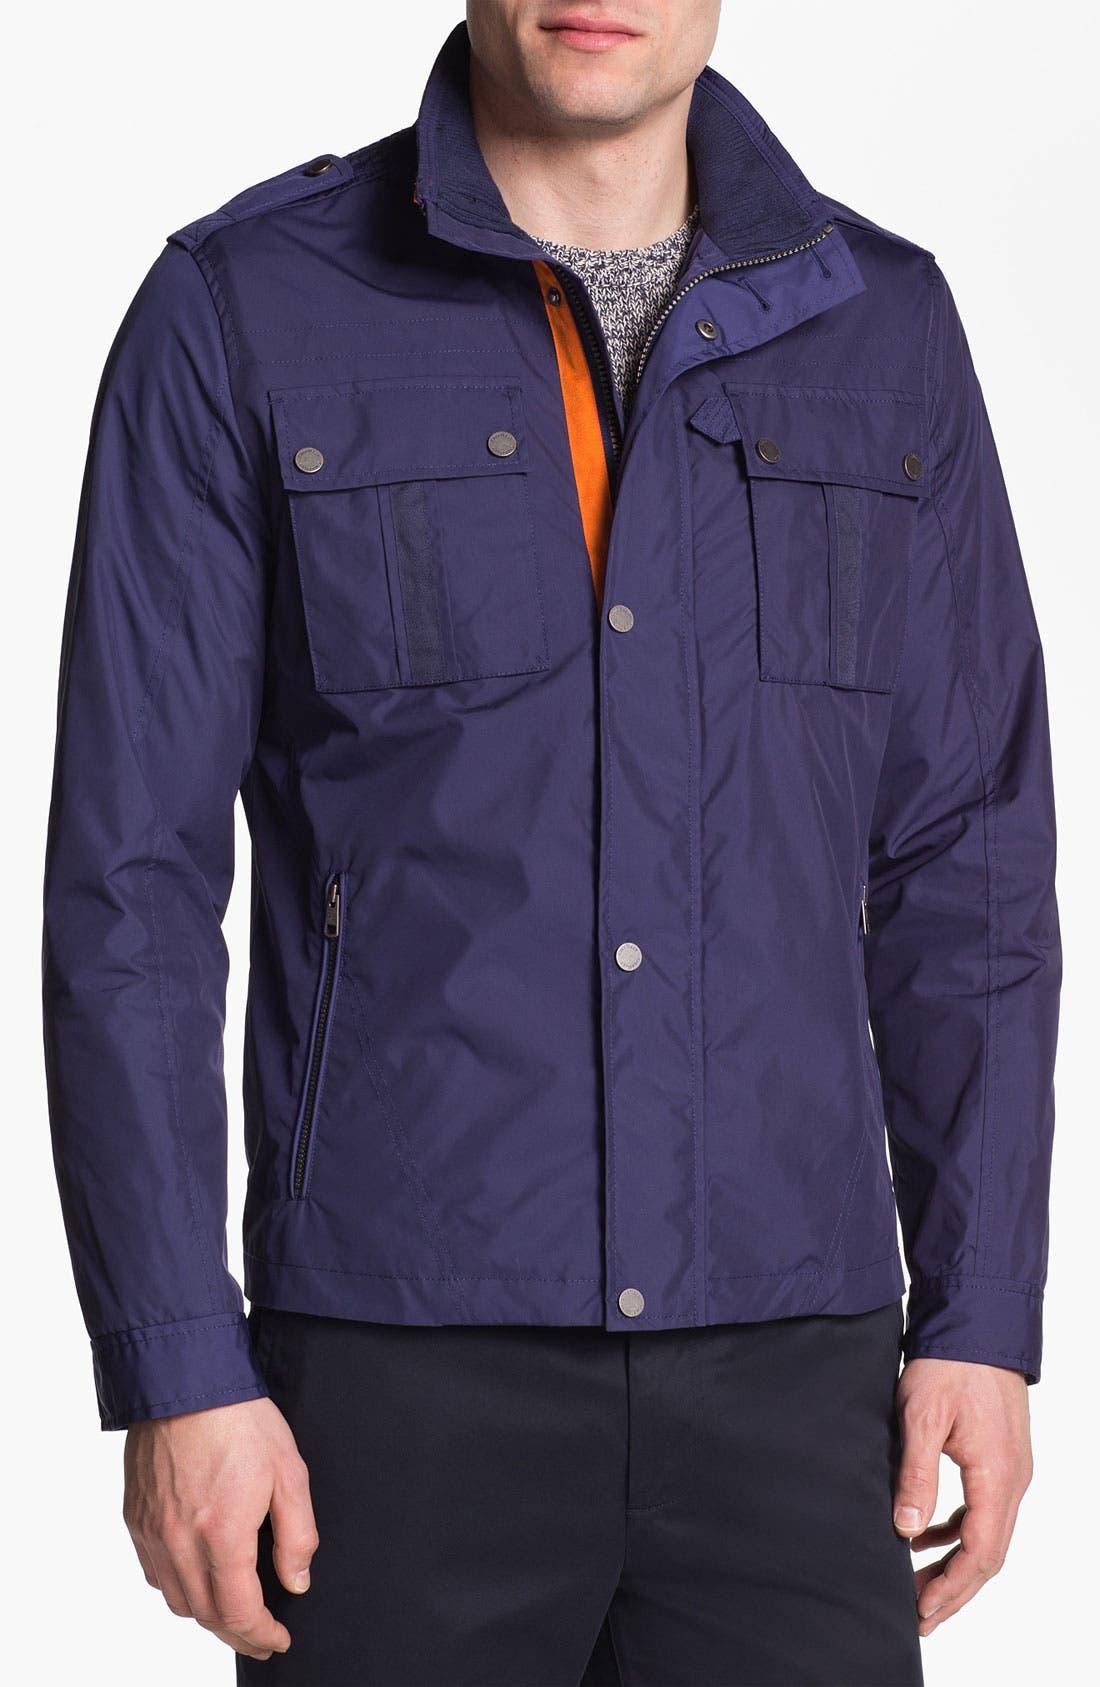 Alternate Image 1 Selected - Cole Haan Water Resistant Jacket